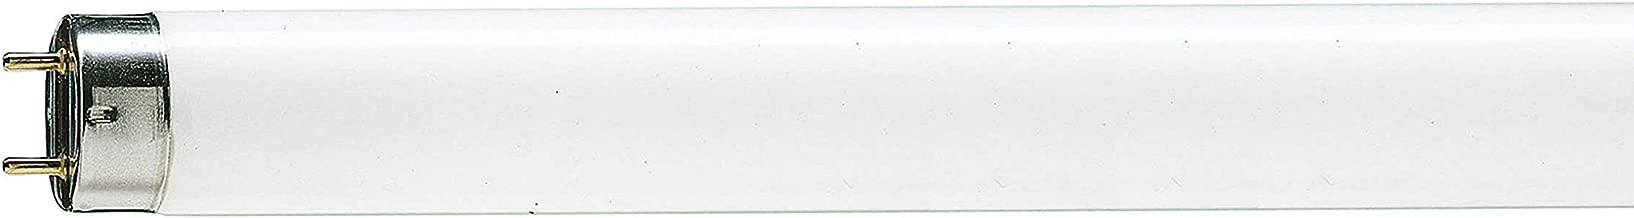 Lâmpada Fluorescente Tubular Philips No Voltagev Branco